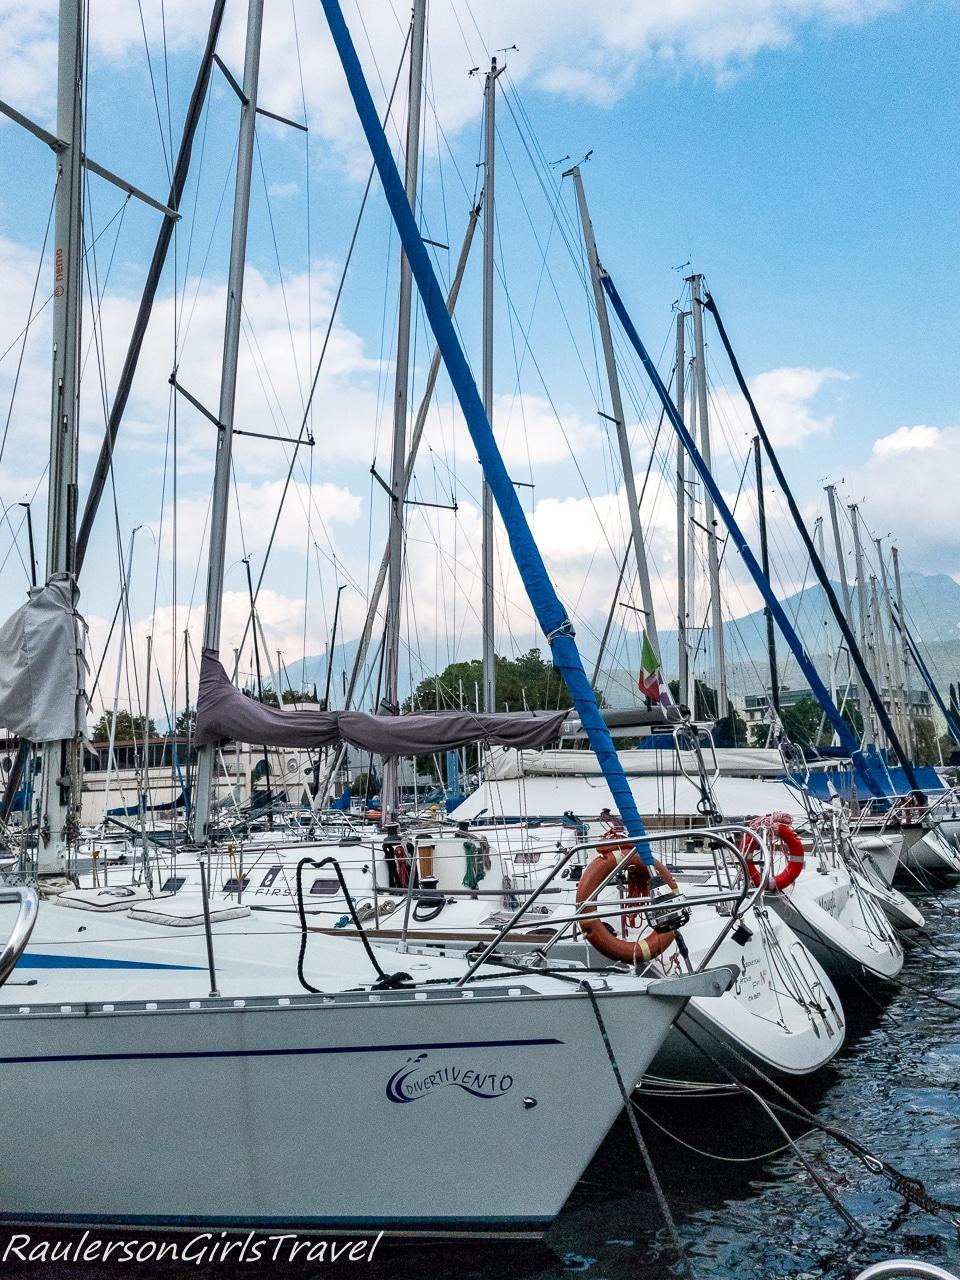 Sailboats docked in the marina in Riva del Garda